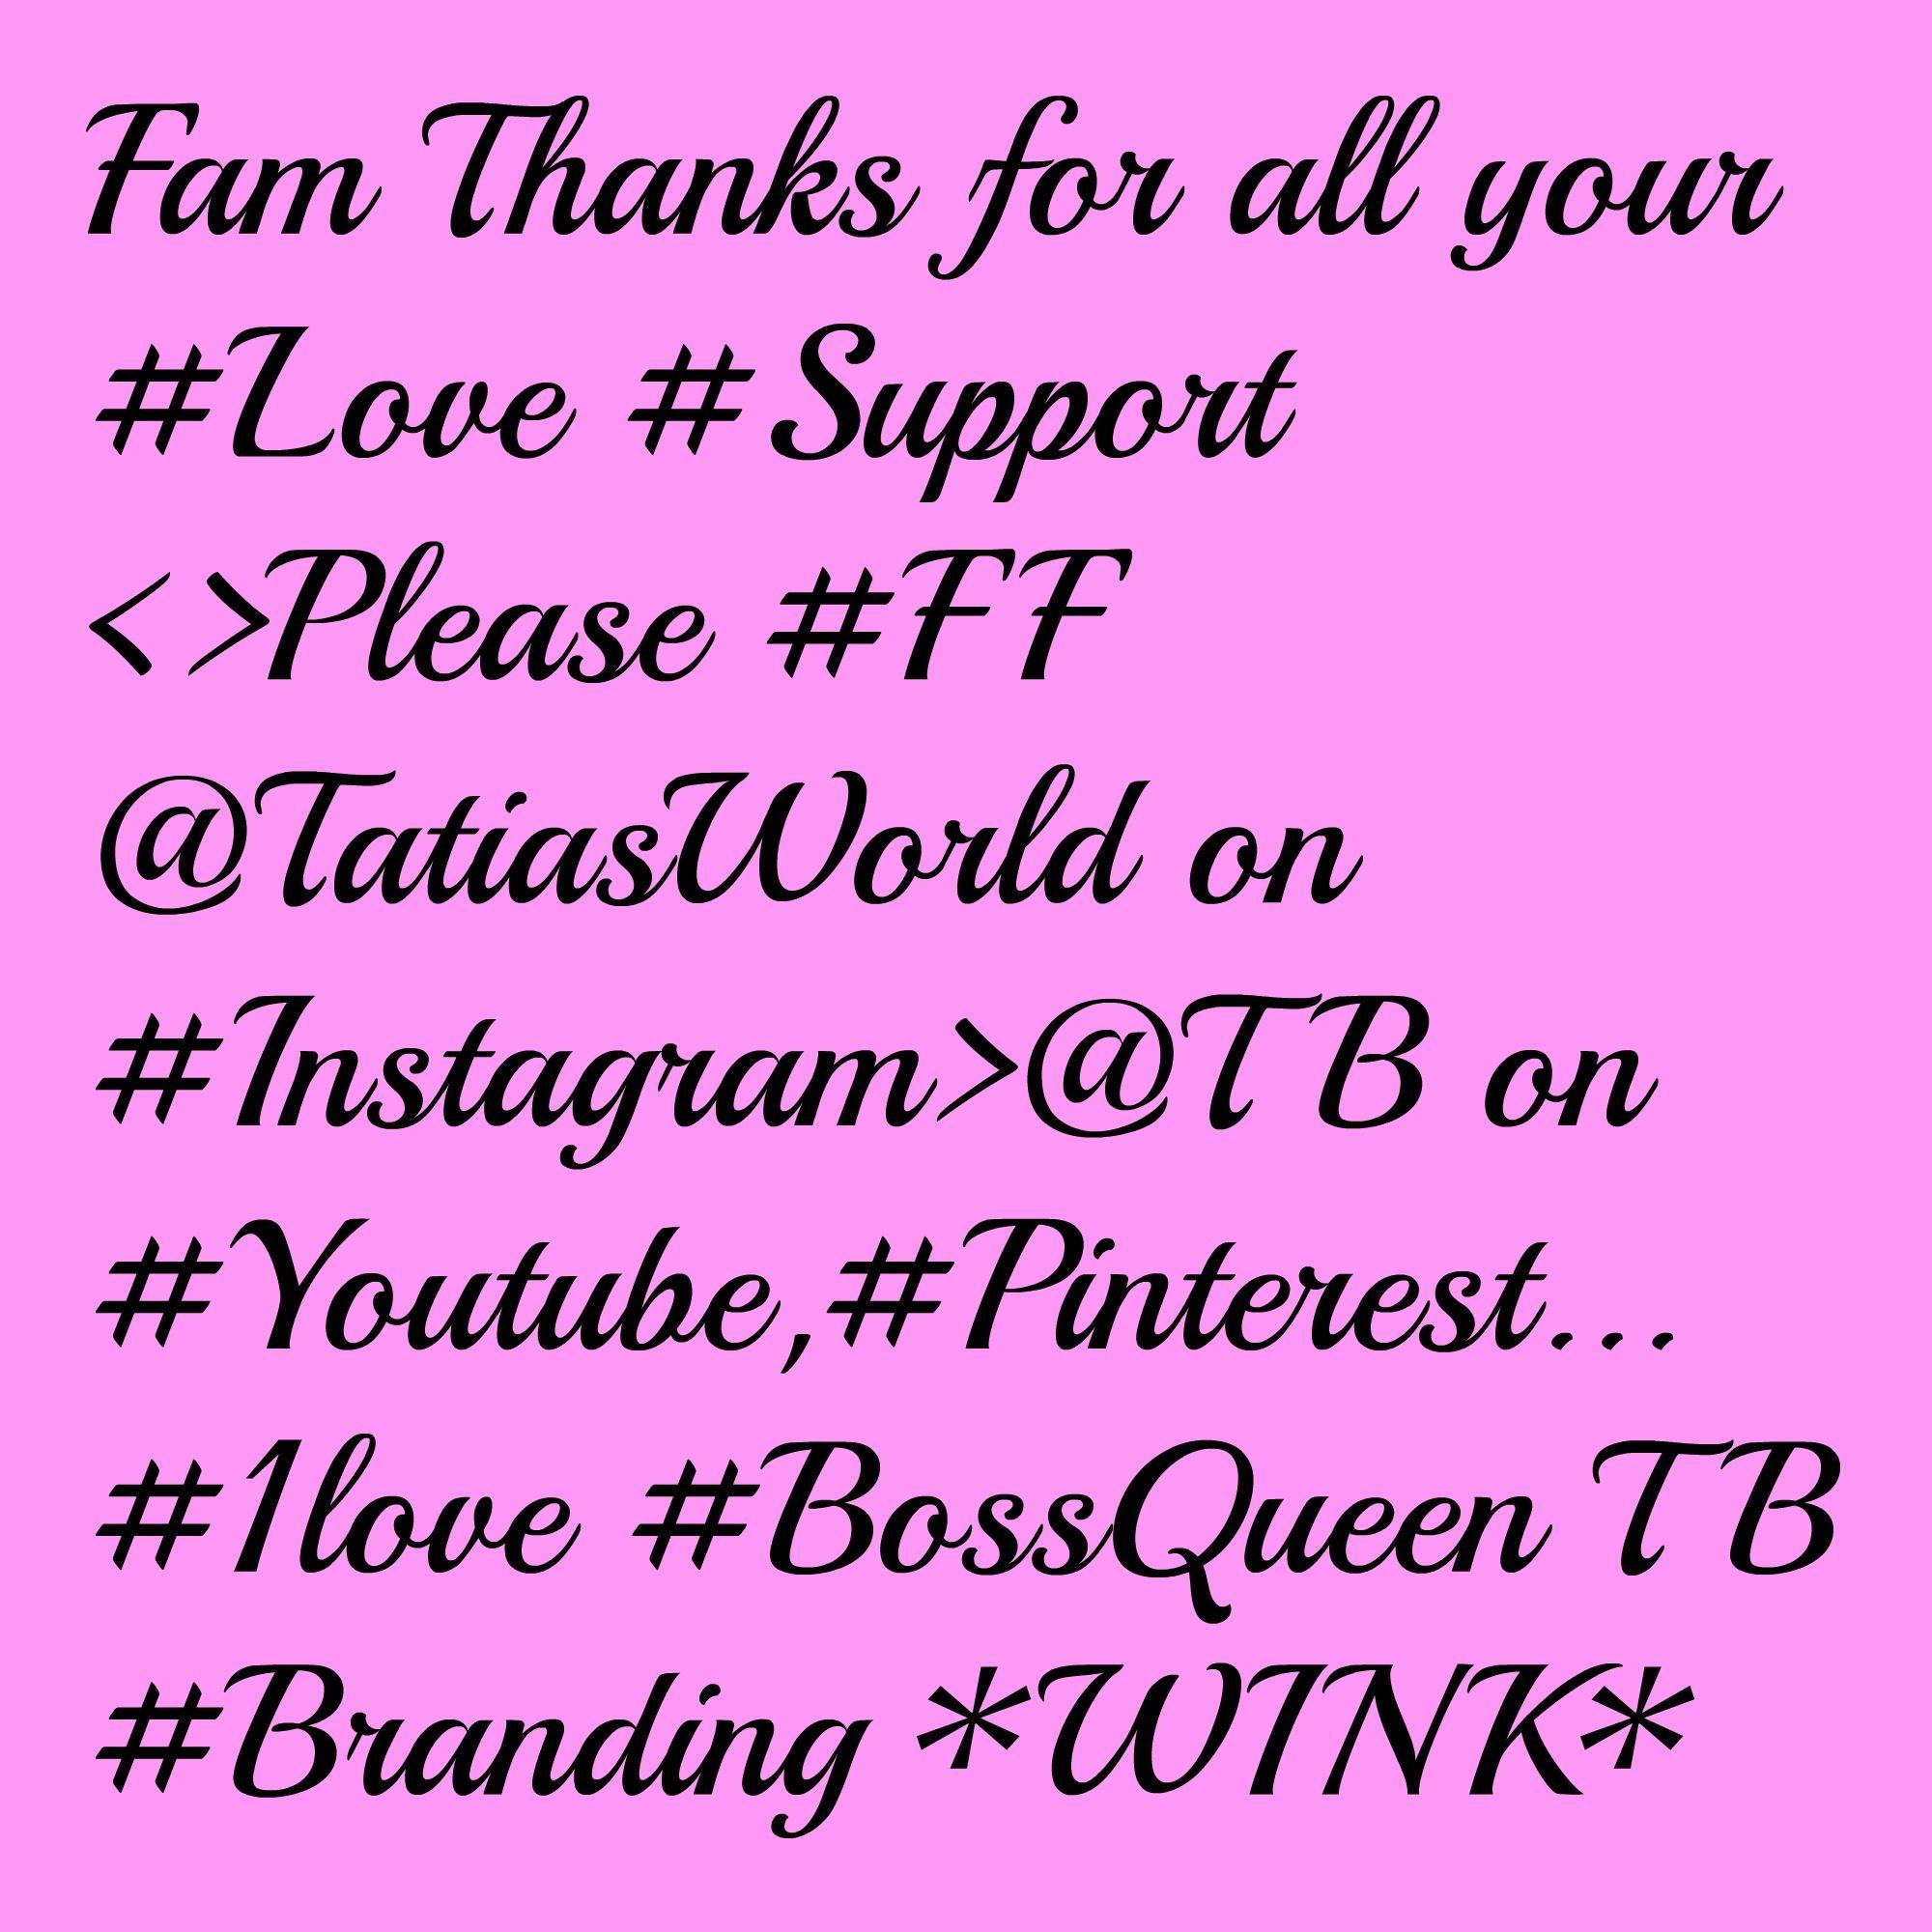 #BRANDING PLEASE #FF #BOSSQUEEN TATIA BRADLEY I'M NOT HARD TO FIND #ONLINE BABY~! THX 1LOVE <HUGS